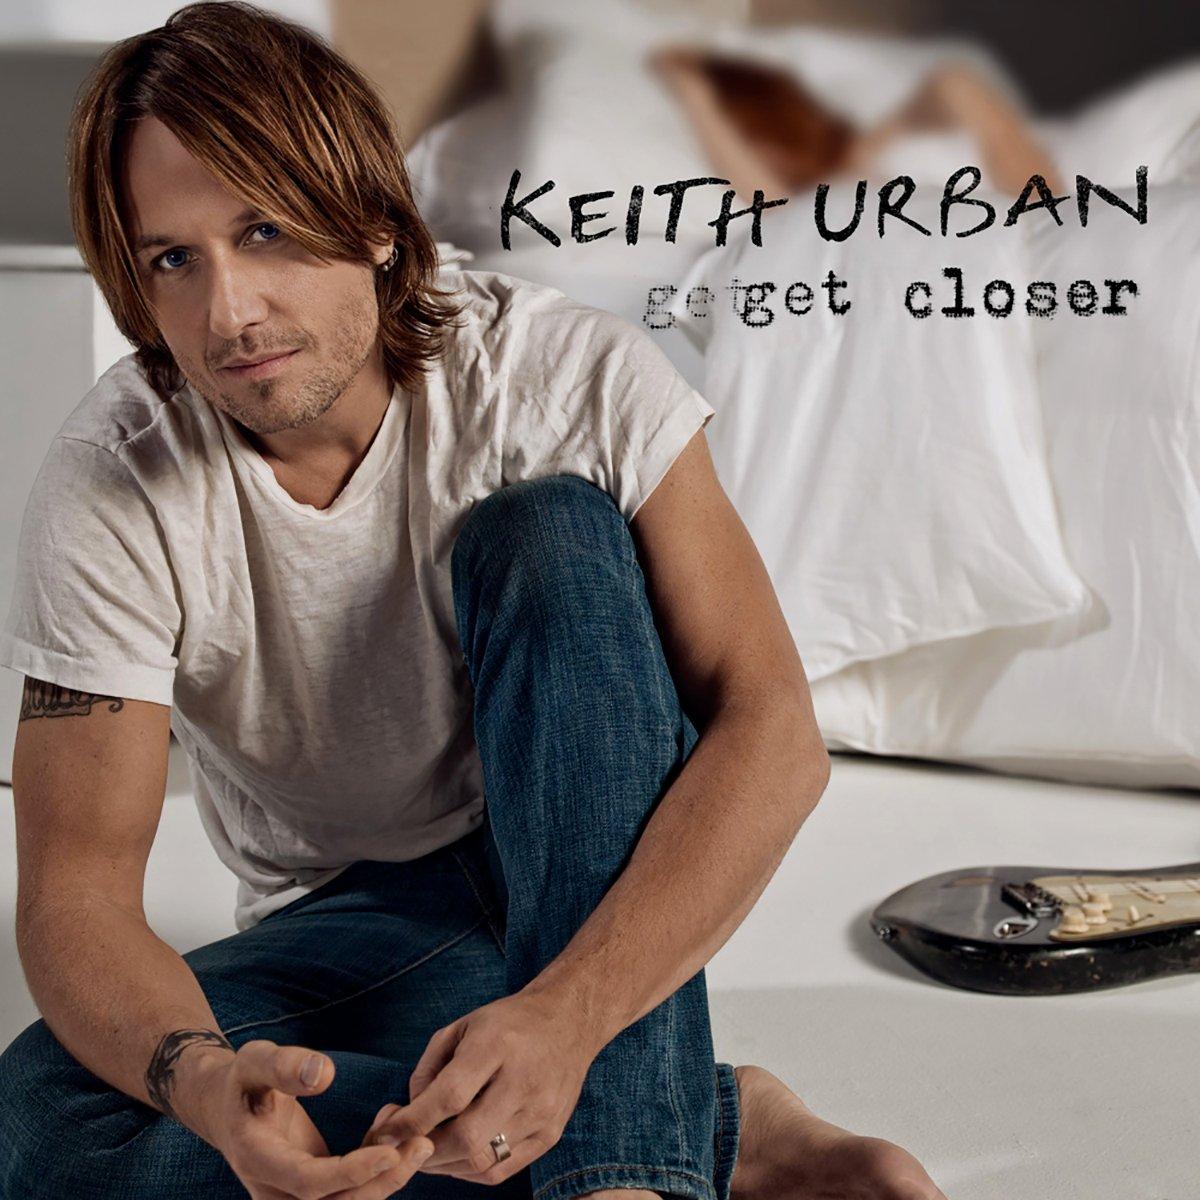 Keith Urban, Get Closer